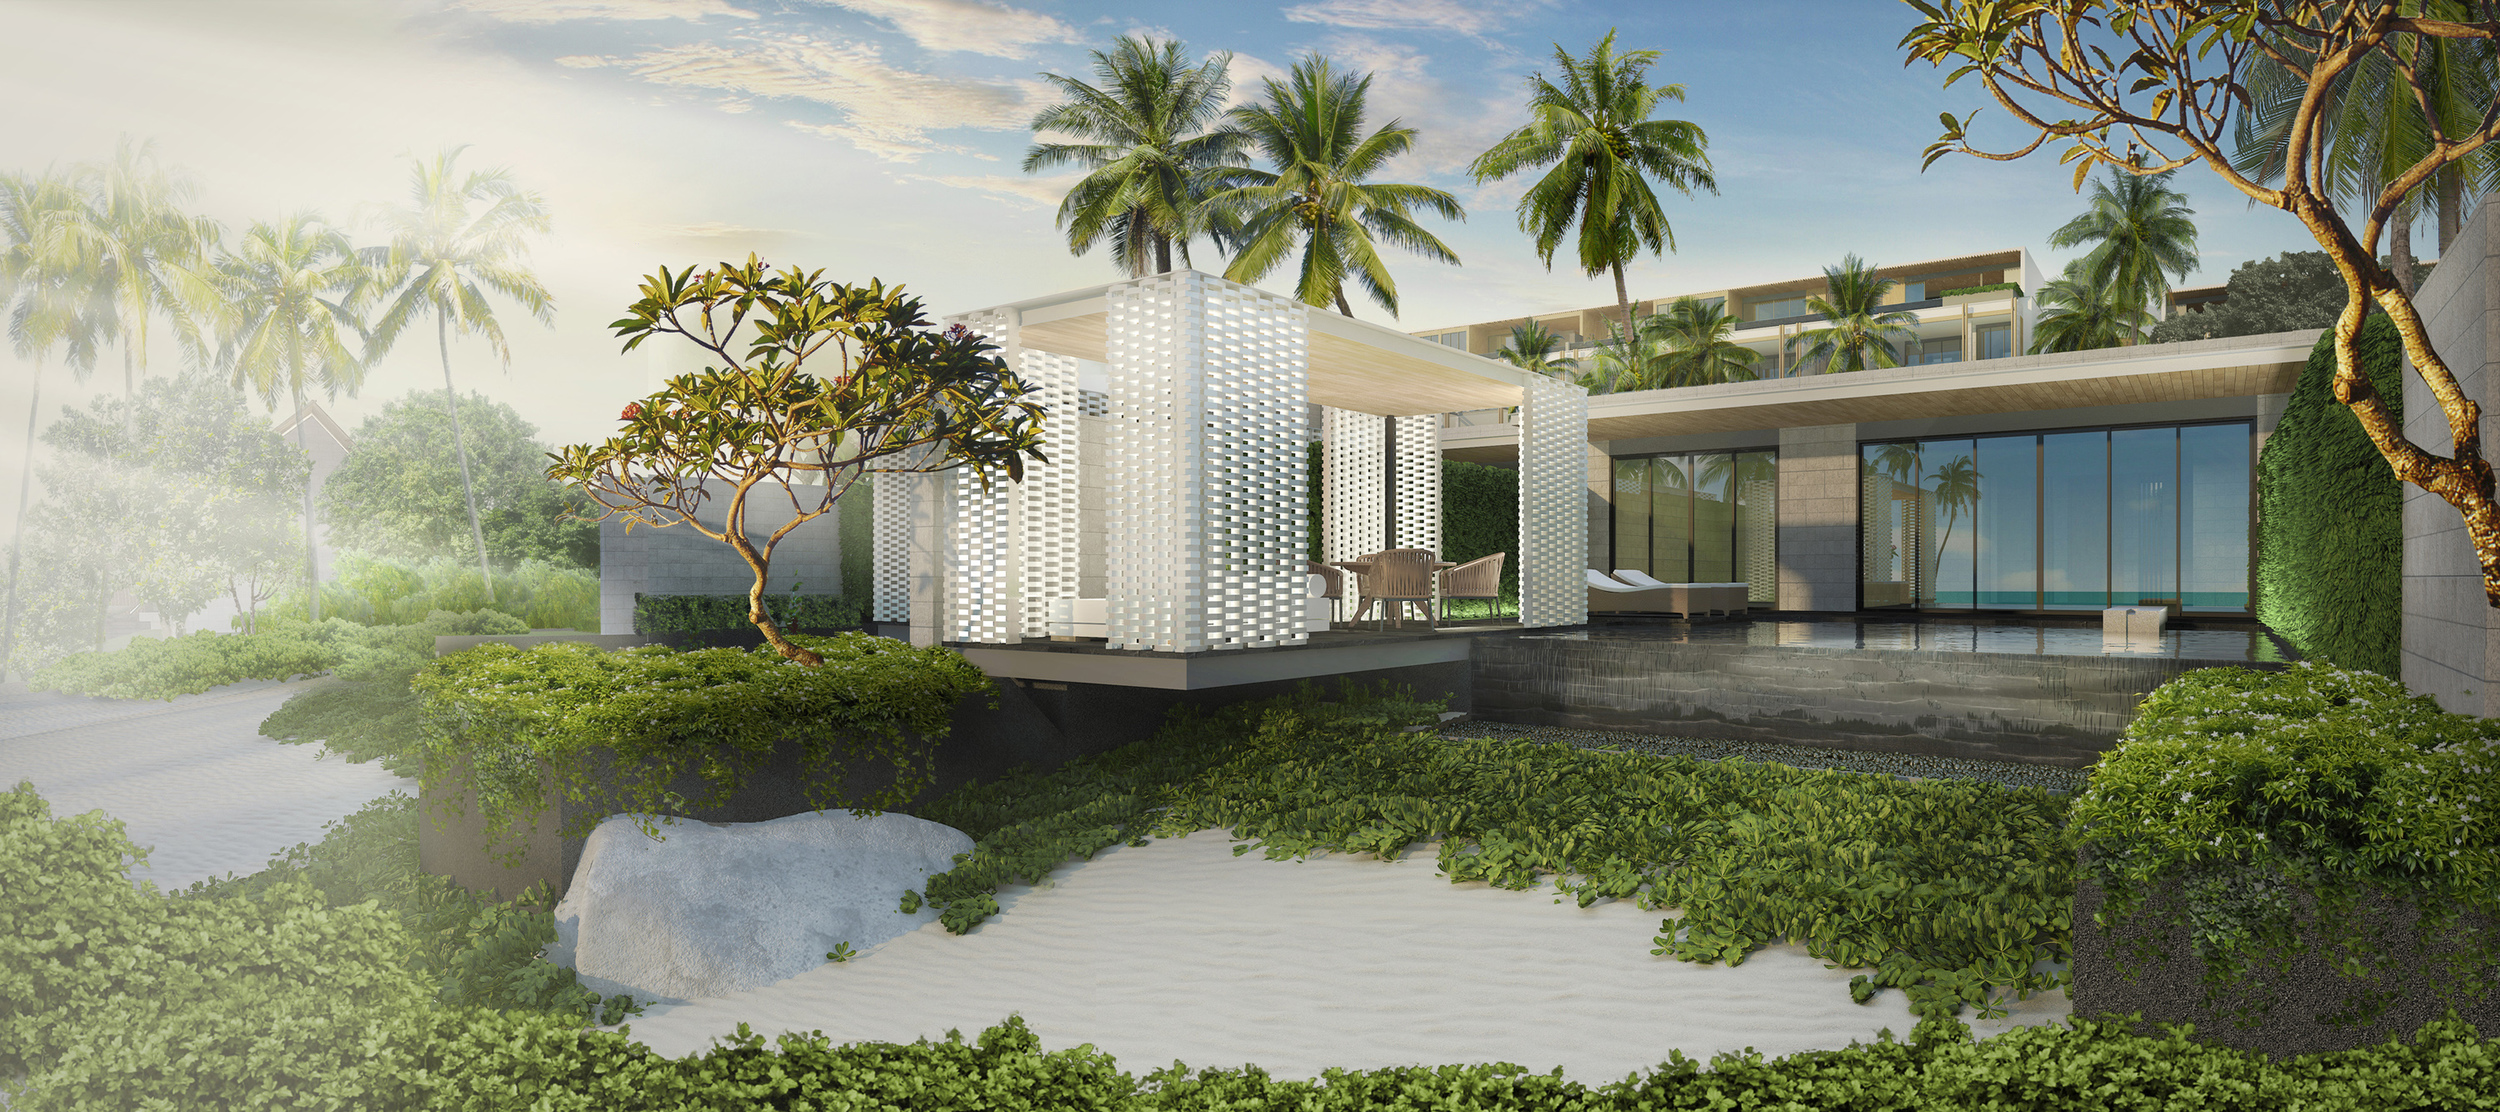 Rosewood Clearwater Bay, Hainan - Beach Villa.jpg